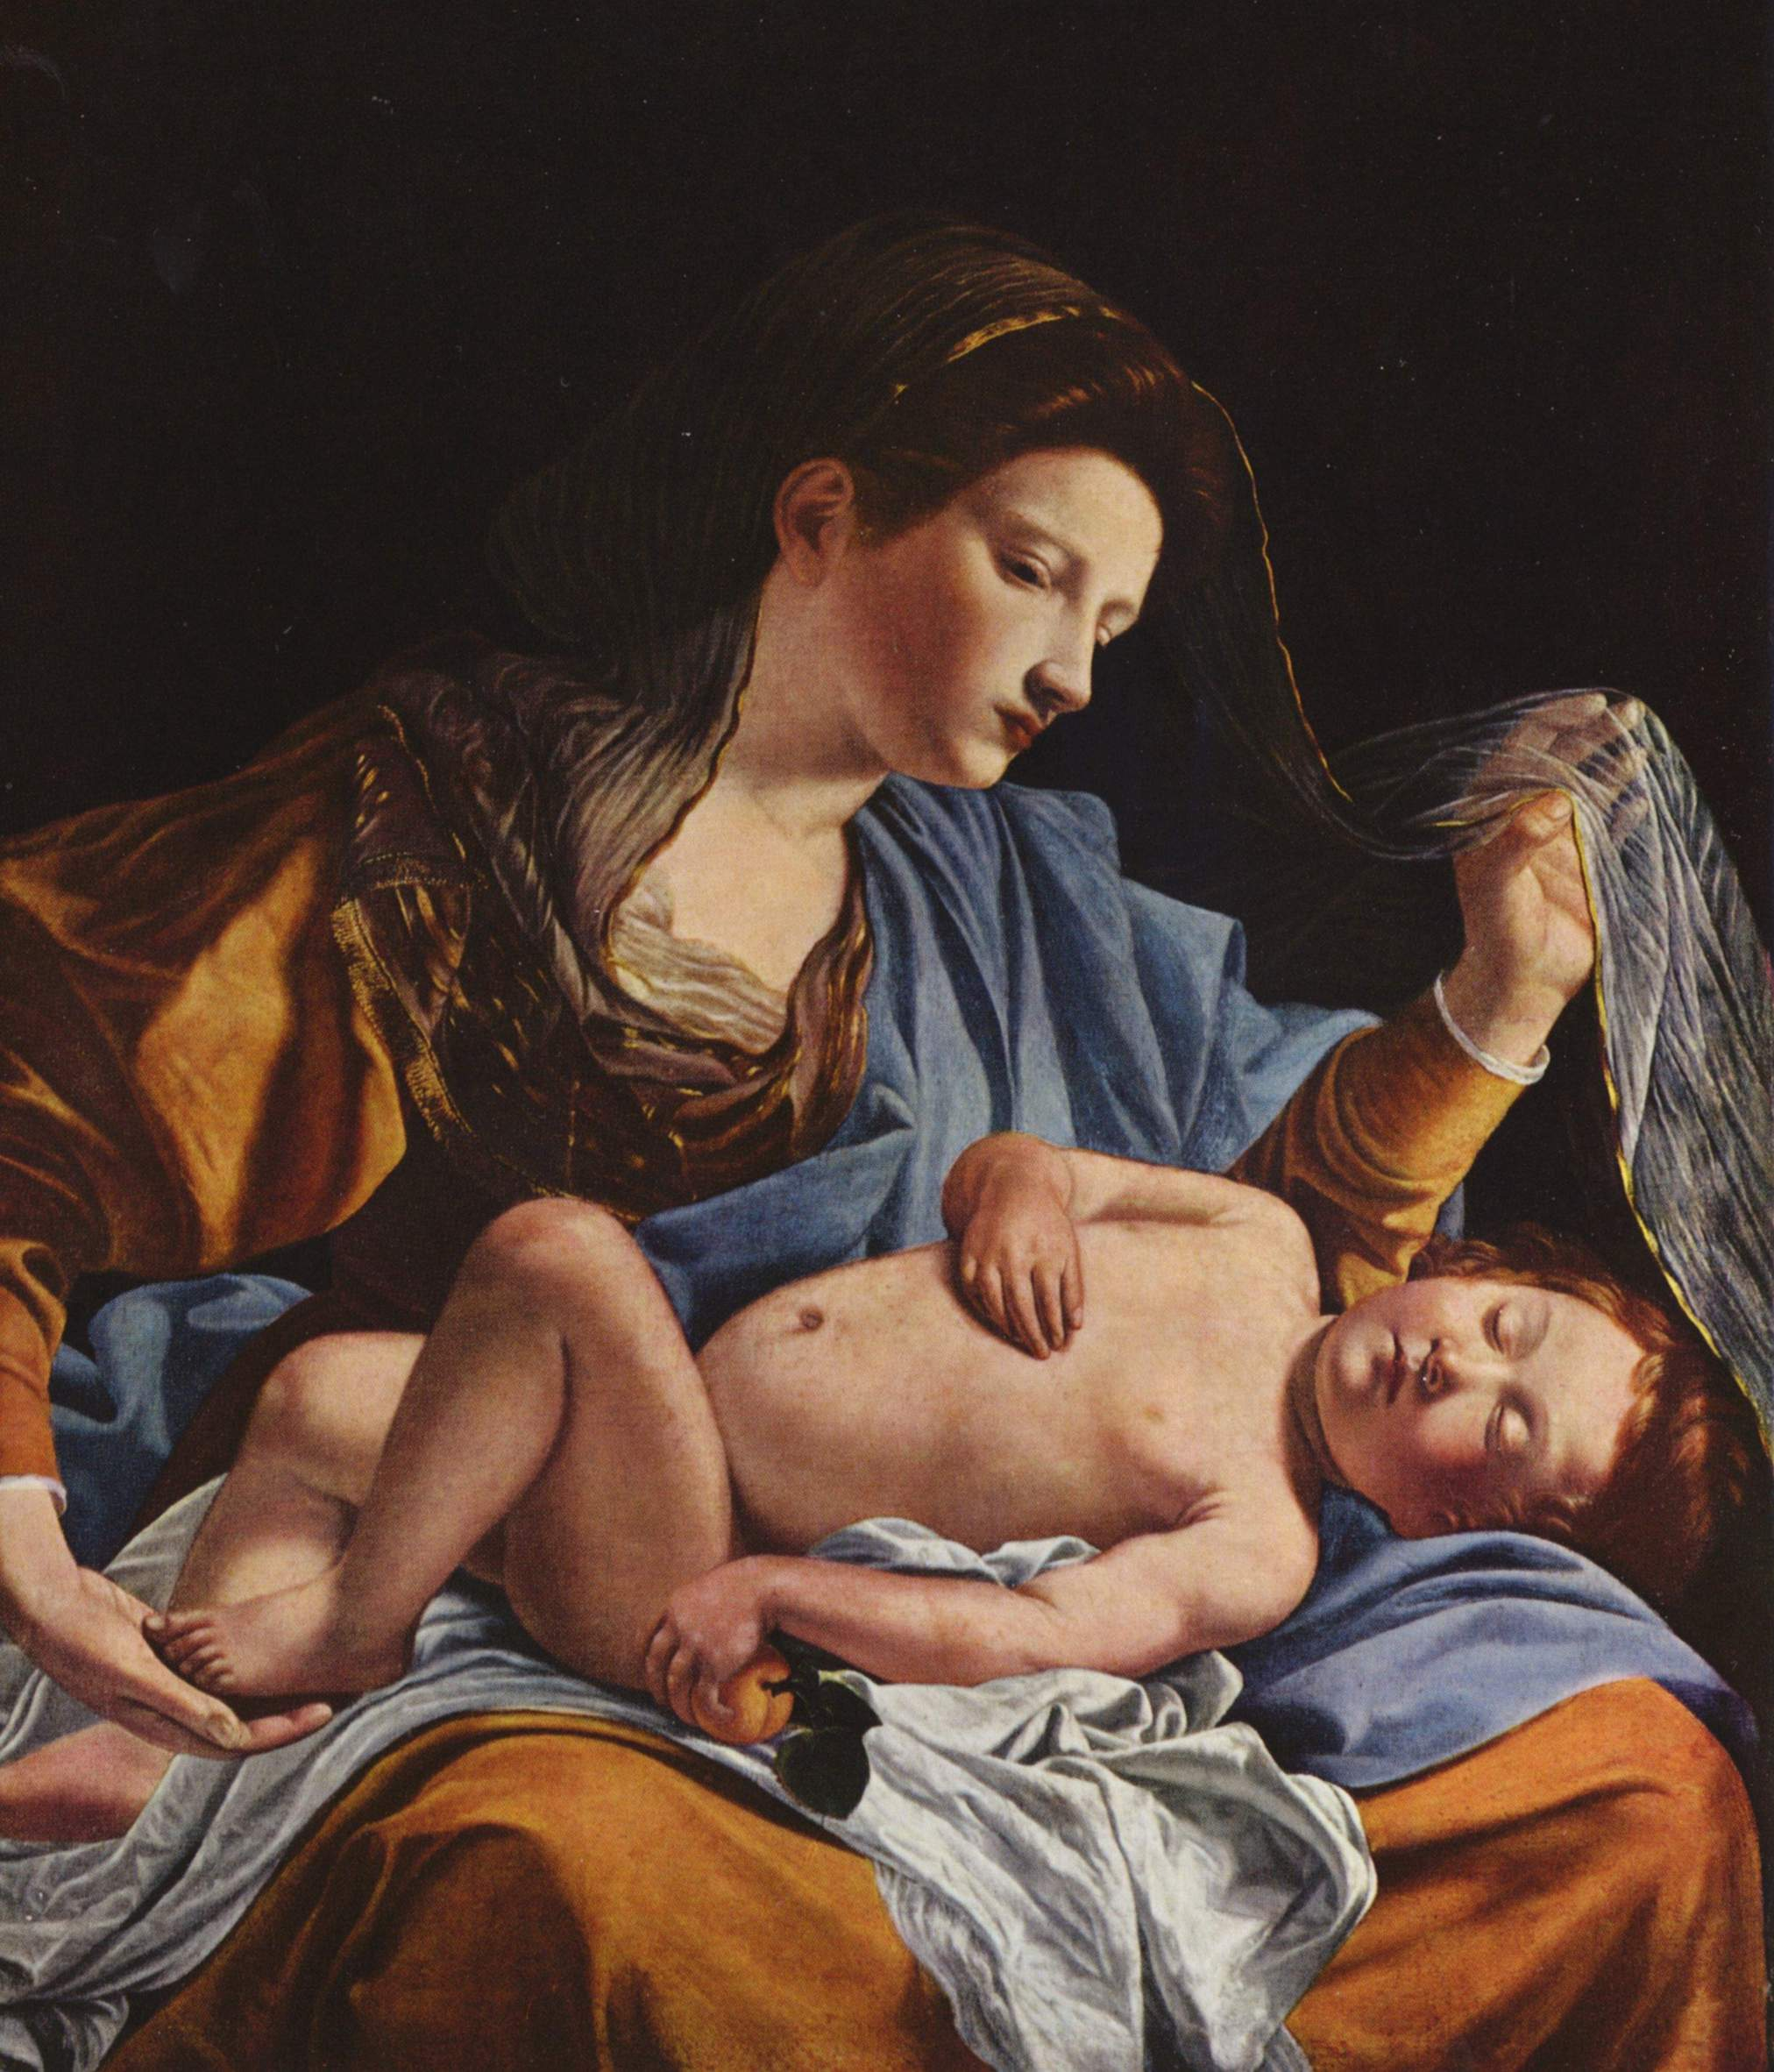 Orazio Gentileschi - Maria mit Kind | Artelista.com